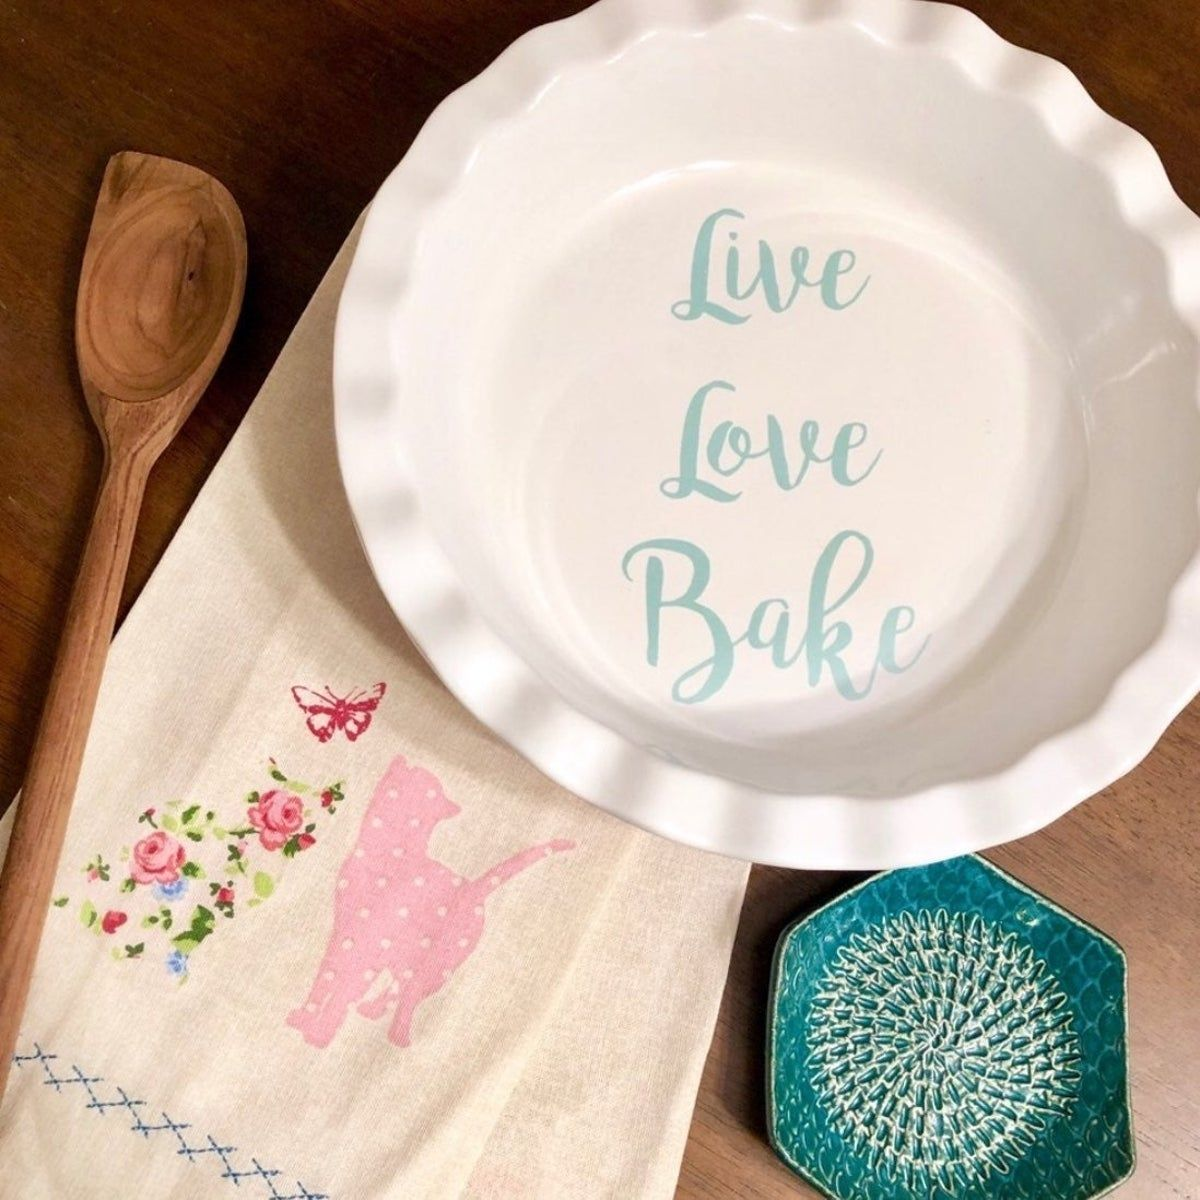 "Live Love Bake • Stone 9.5"" Pie Pan"